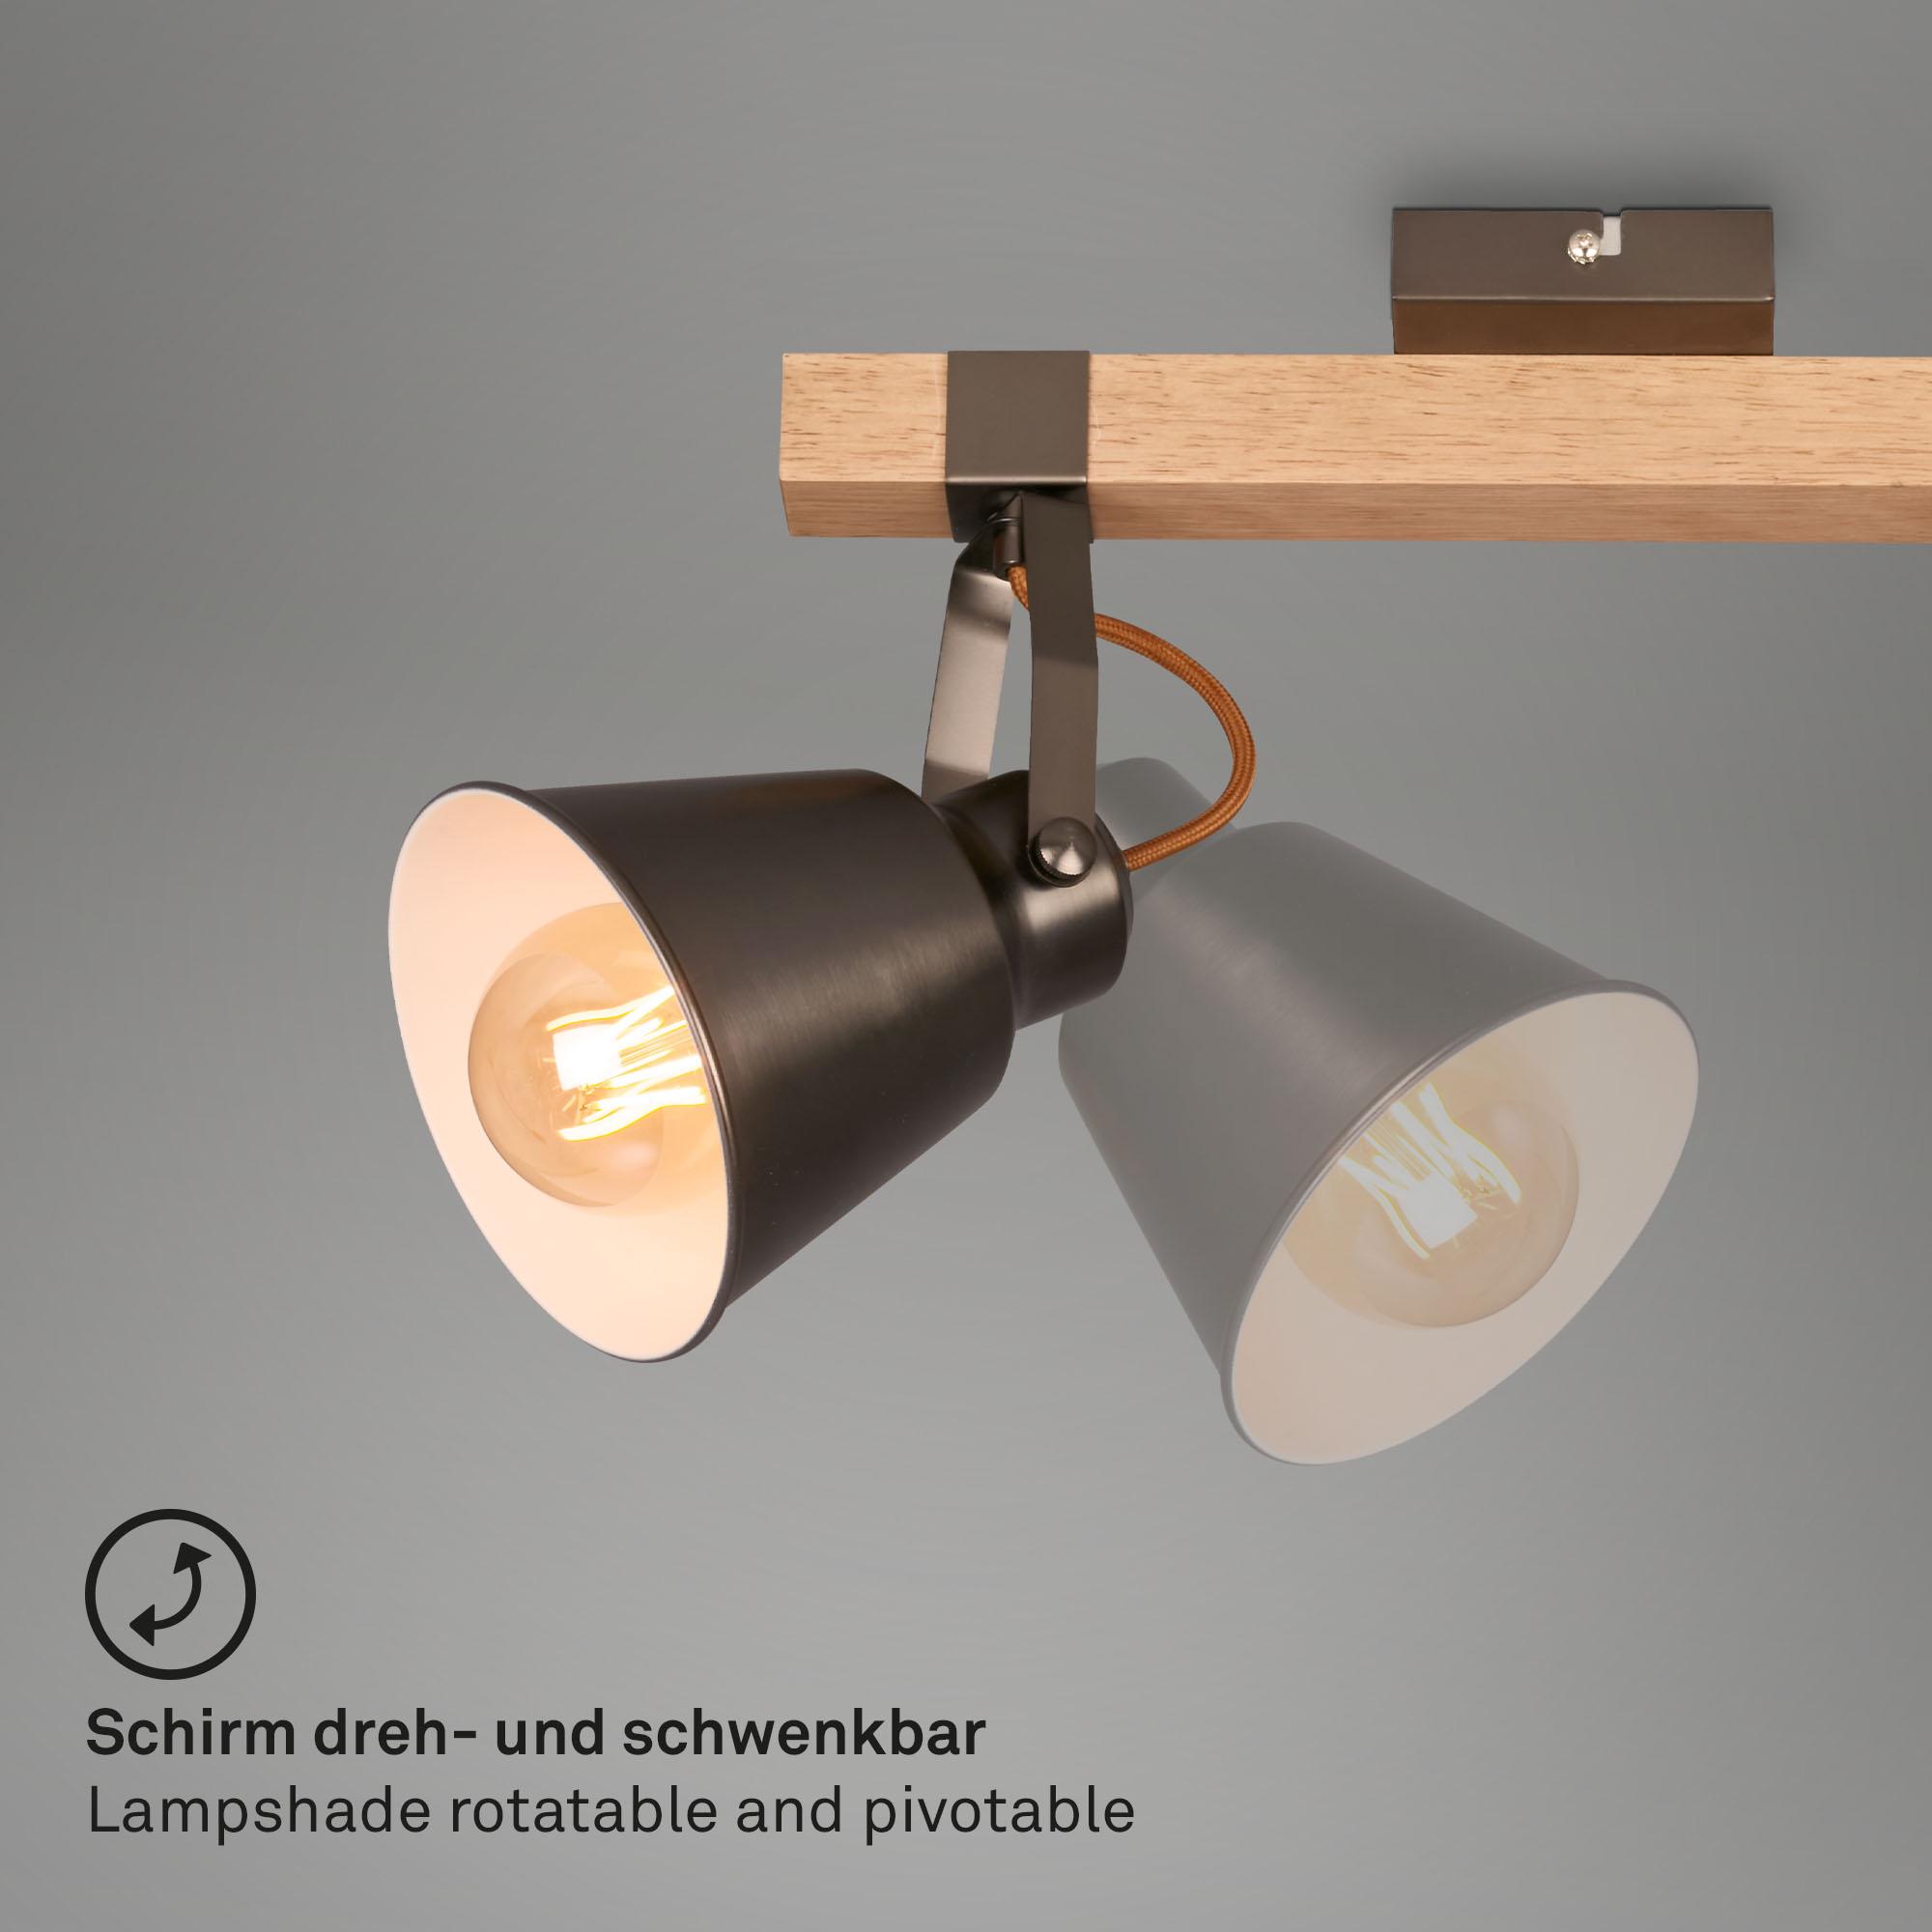 Vintage Spotleuchte 3-flammig Metall-Holz antik-grau dreh- und schwenkbar